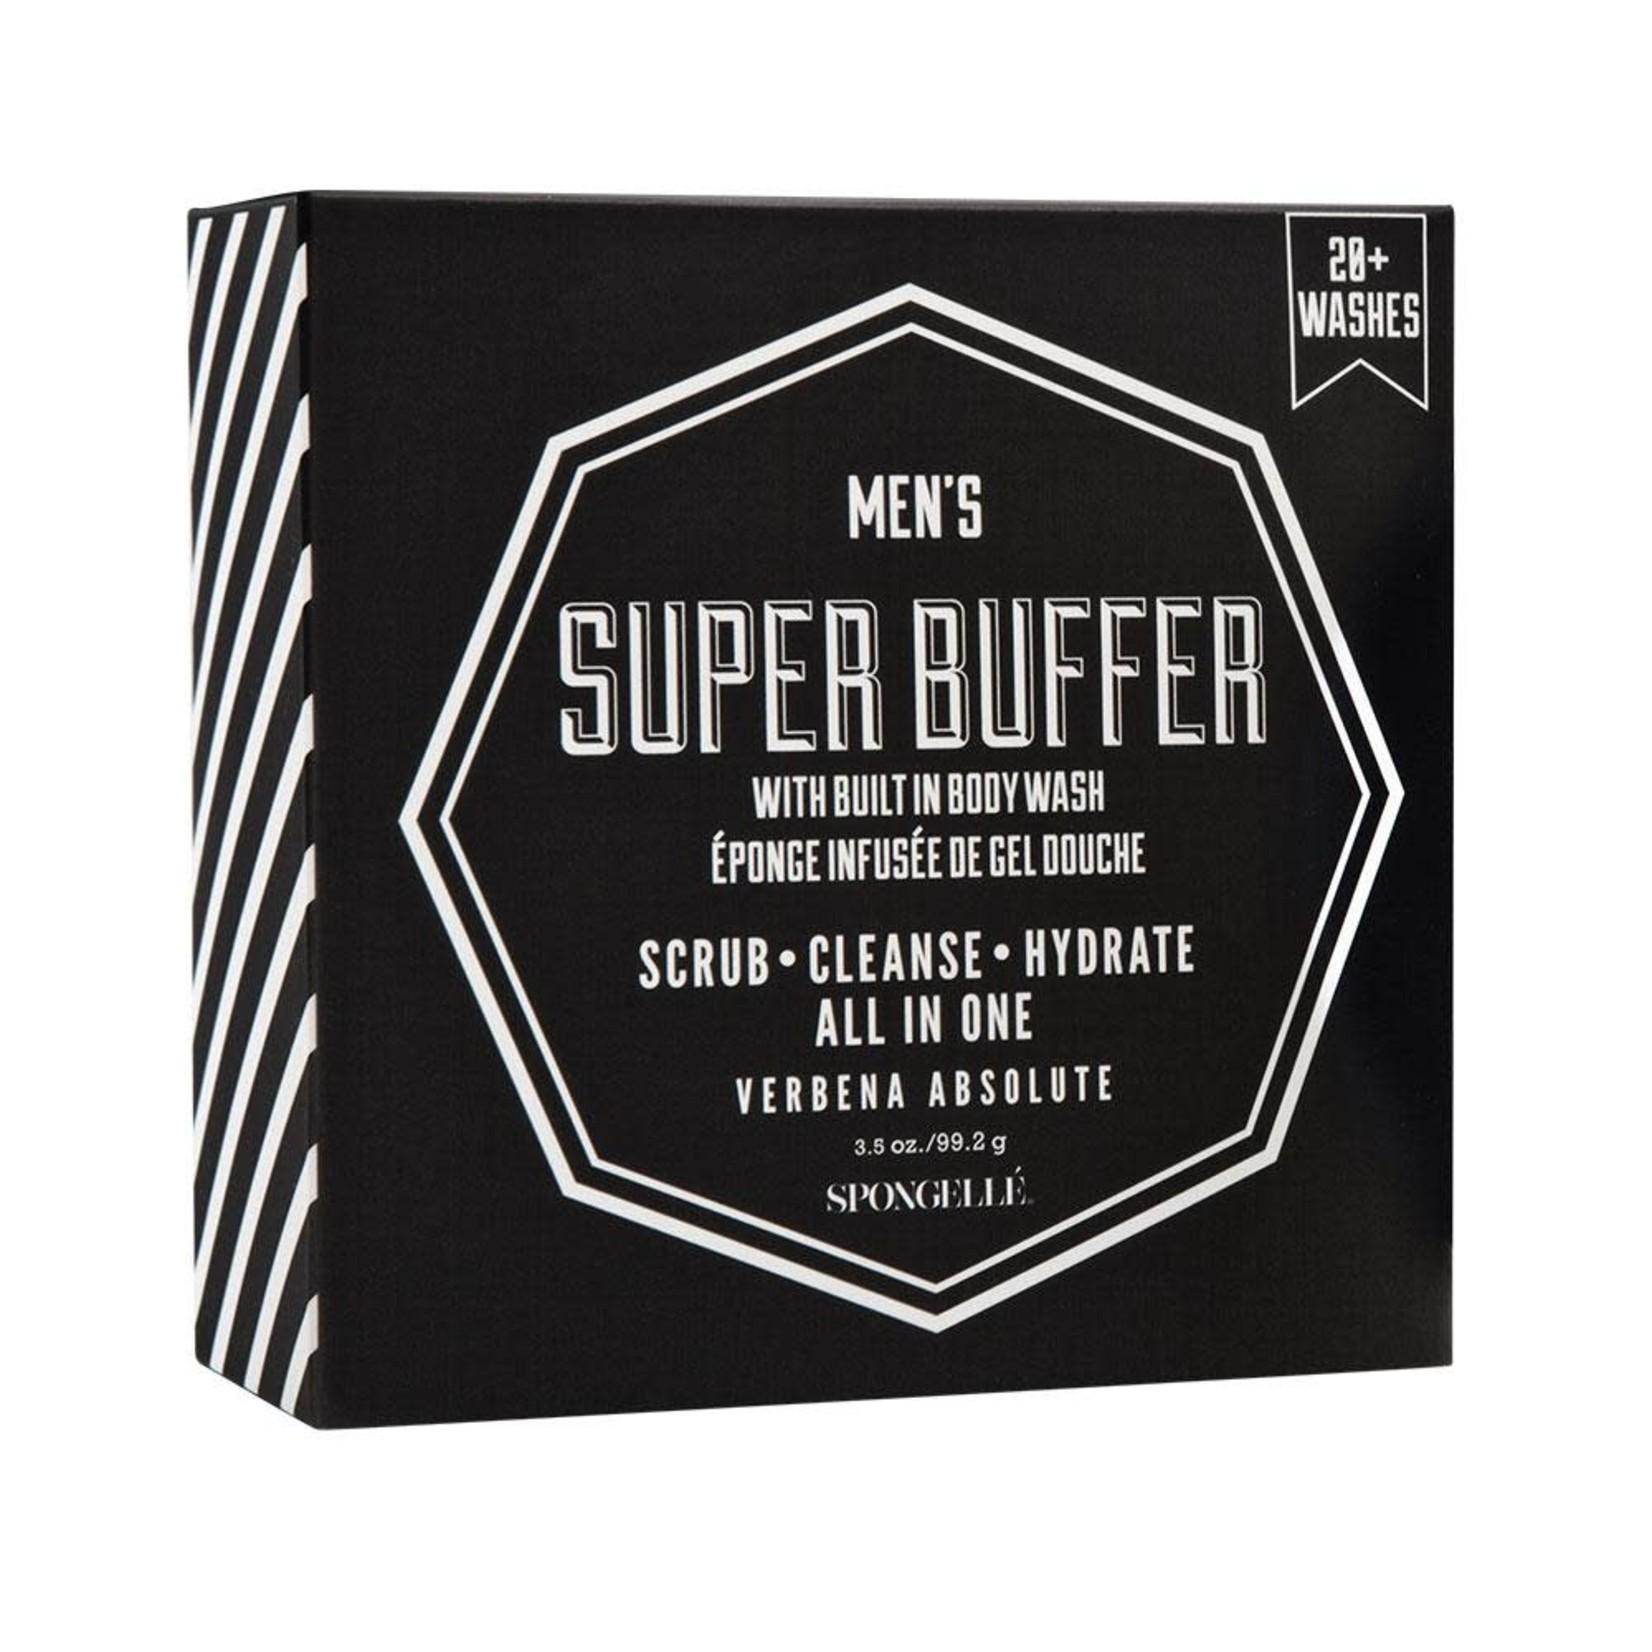 Spongelle Men's Super Buffer | Verbena Absolute